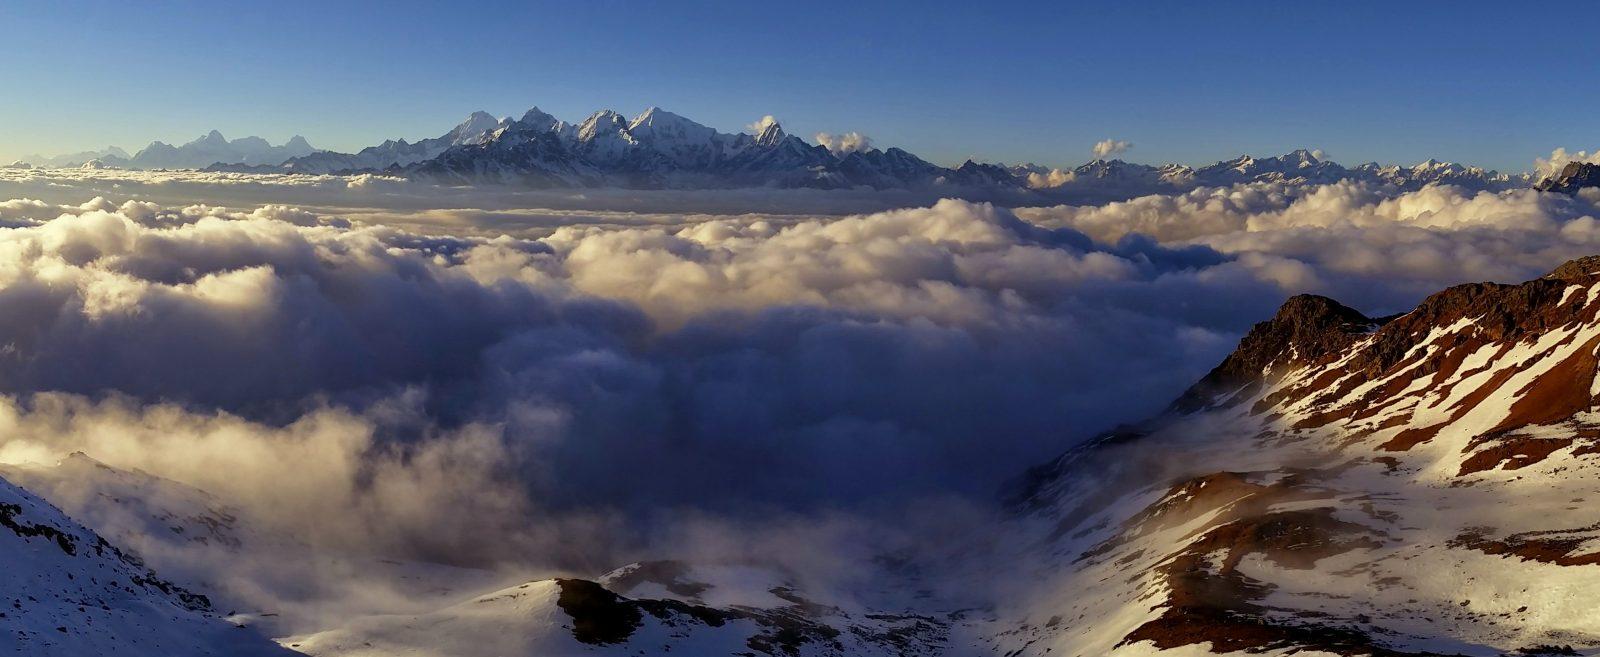 Himalaya Ranges , from left: Annapurna; Manaslu; Ganesh Himal; Tibet; Langtang